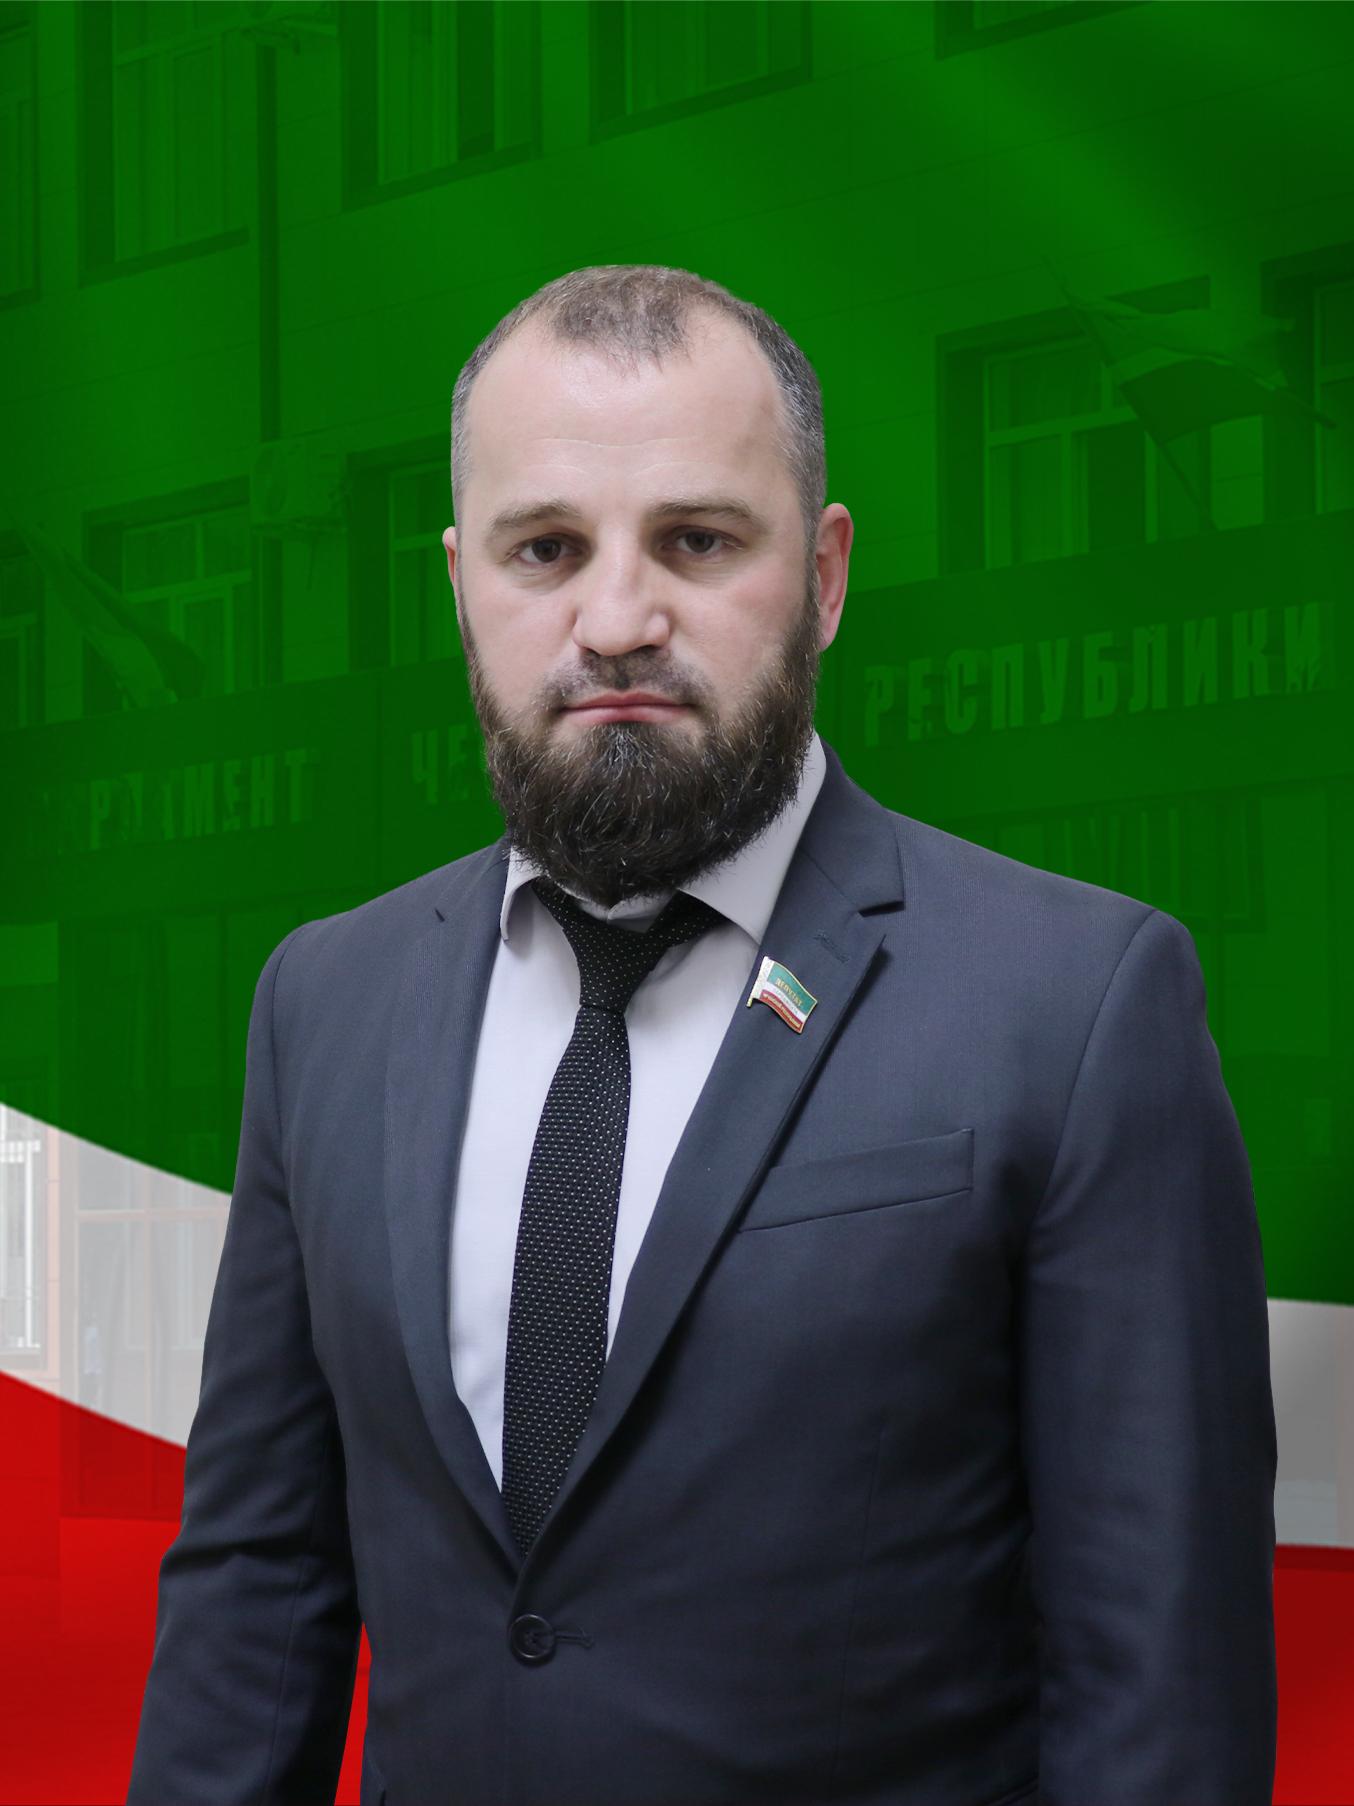 Айбуев Бекхан Султанович